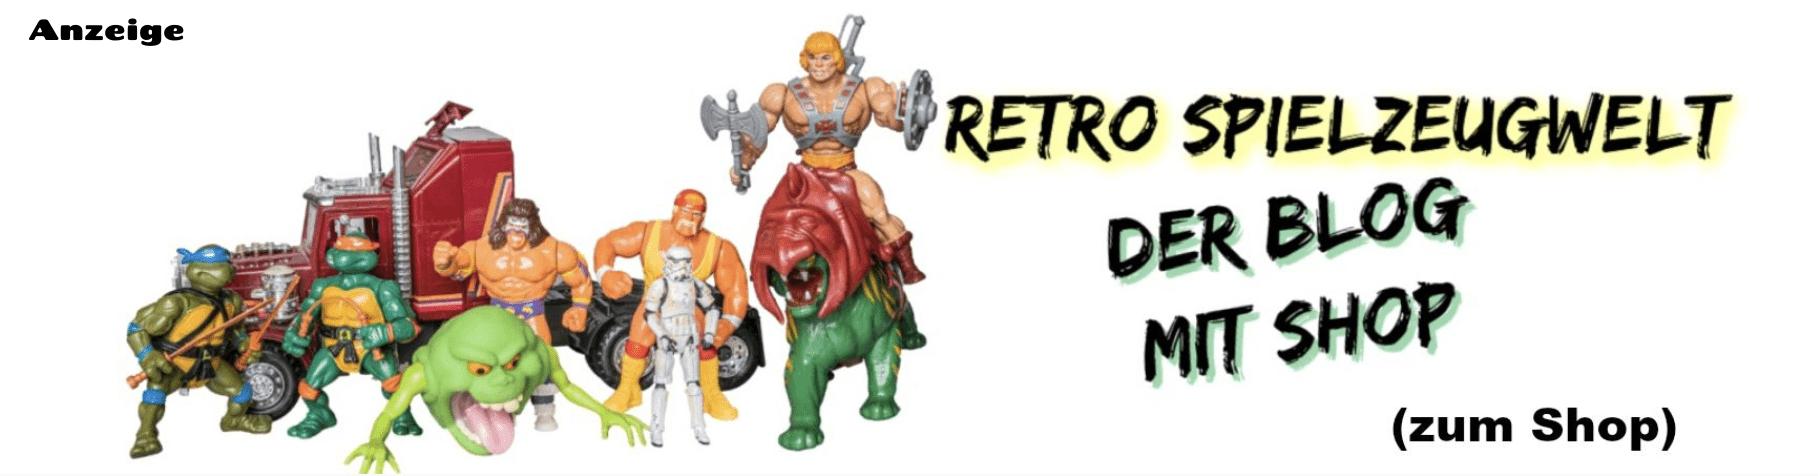 Retro Spielzeugwelt Shop